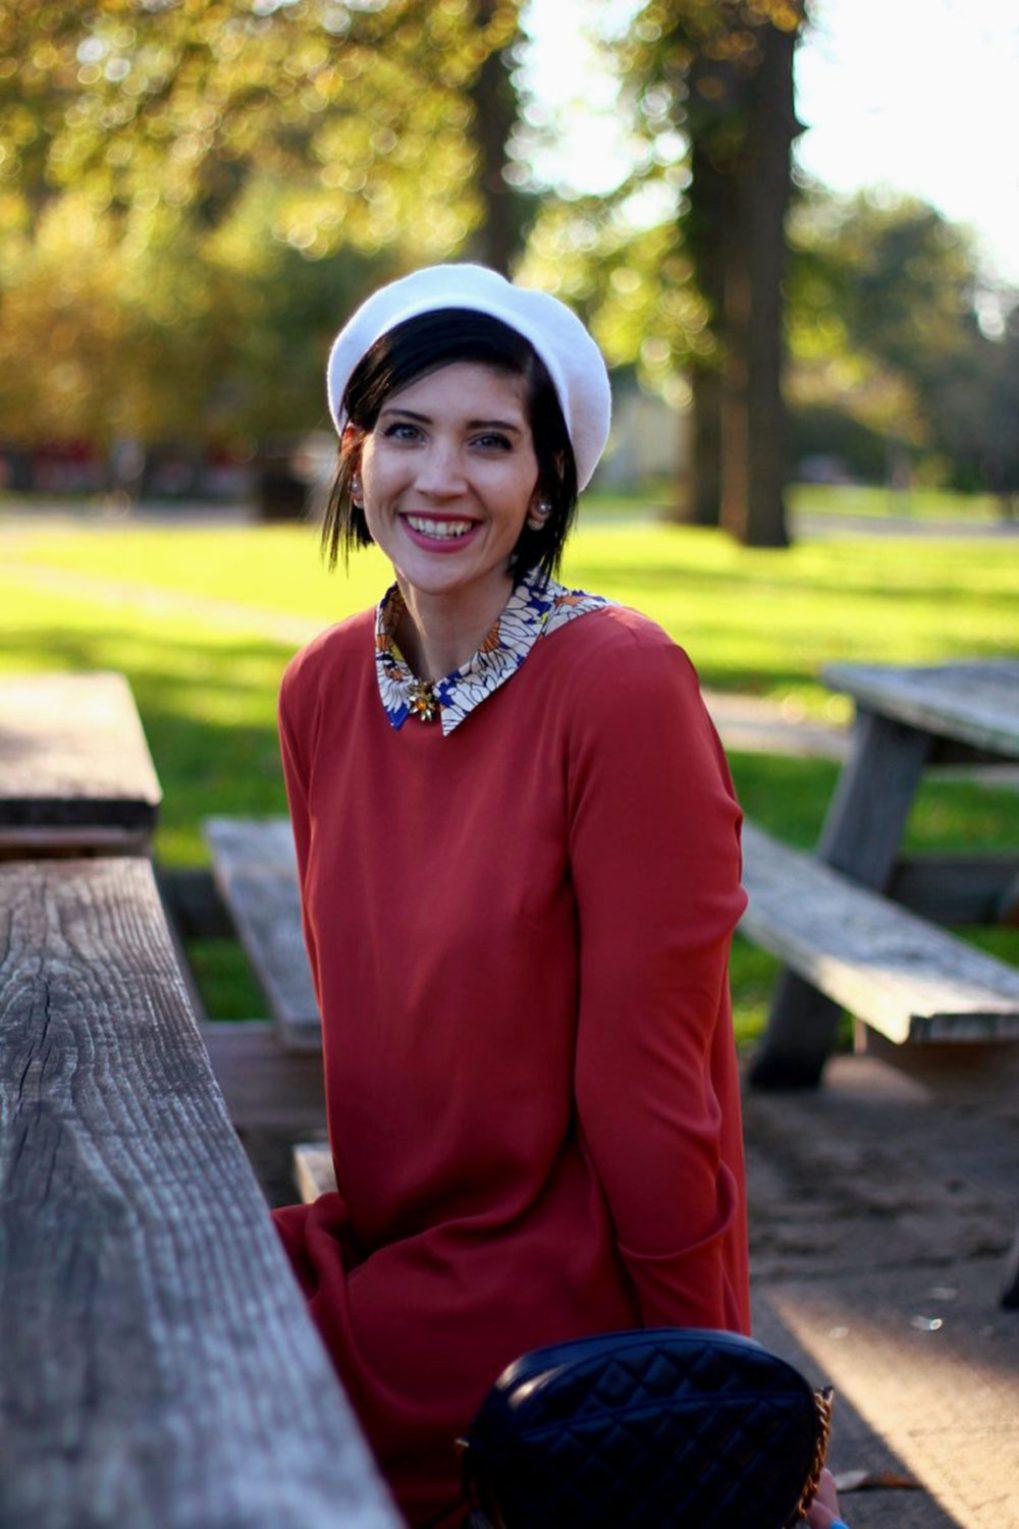 Outfit: Orange retro style dress, flower collar, jewel flower brooch, cream colored beret